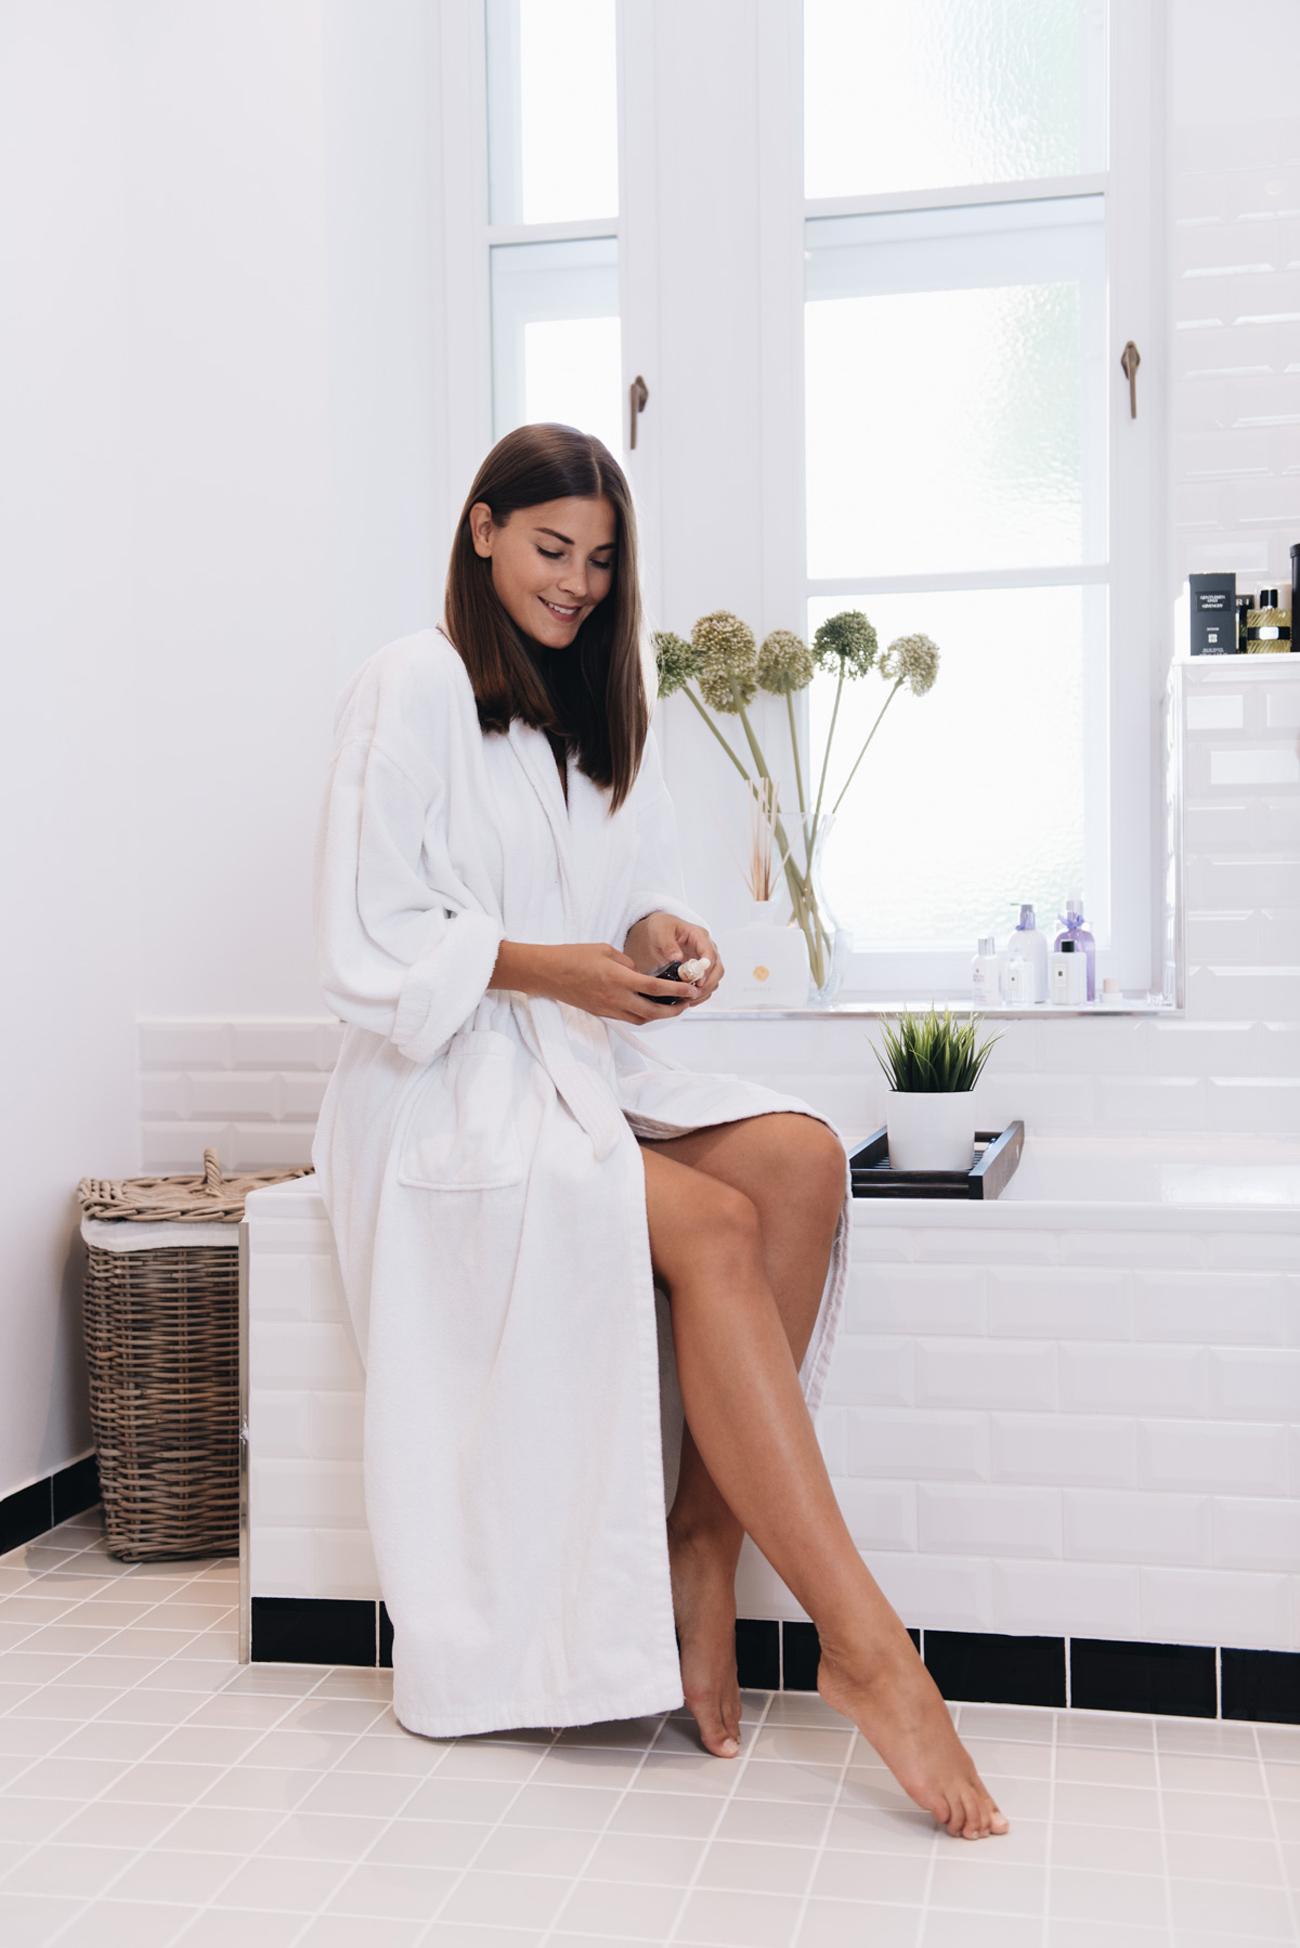 beauyt-blogger-deutschland-münchen-beauty-shooting-badezimmer-fashiioncarpet